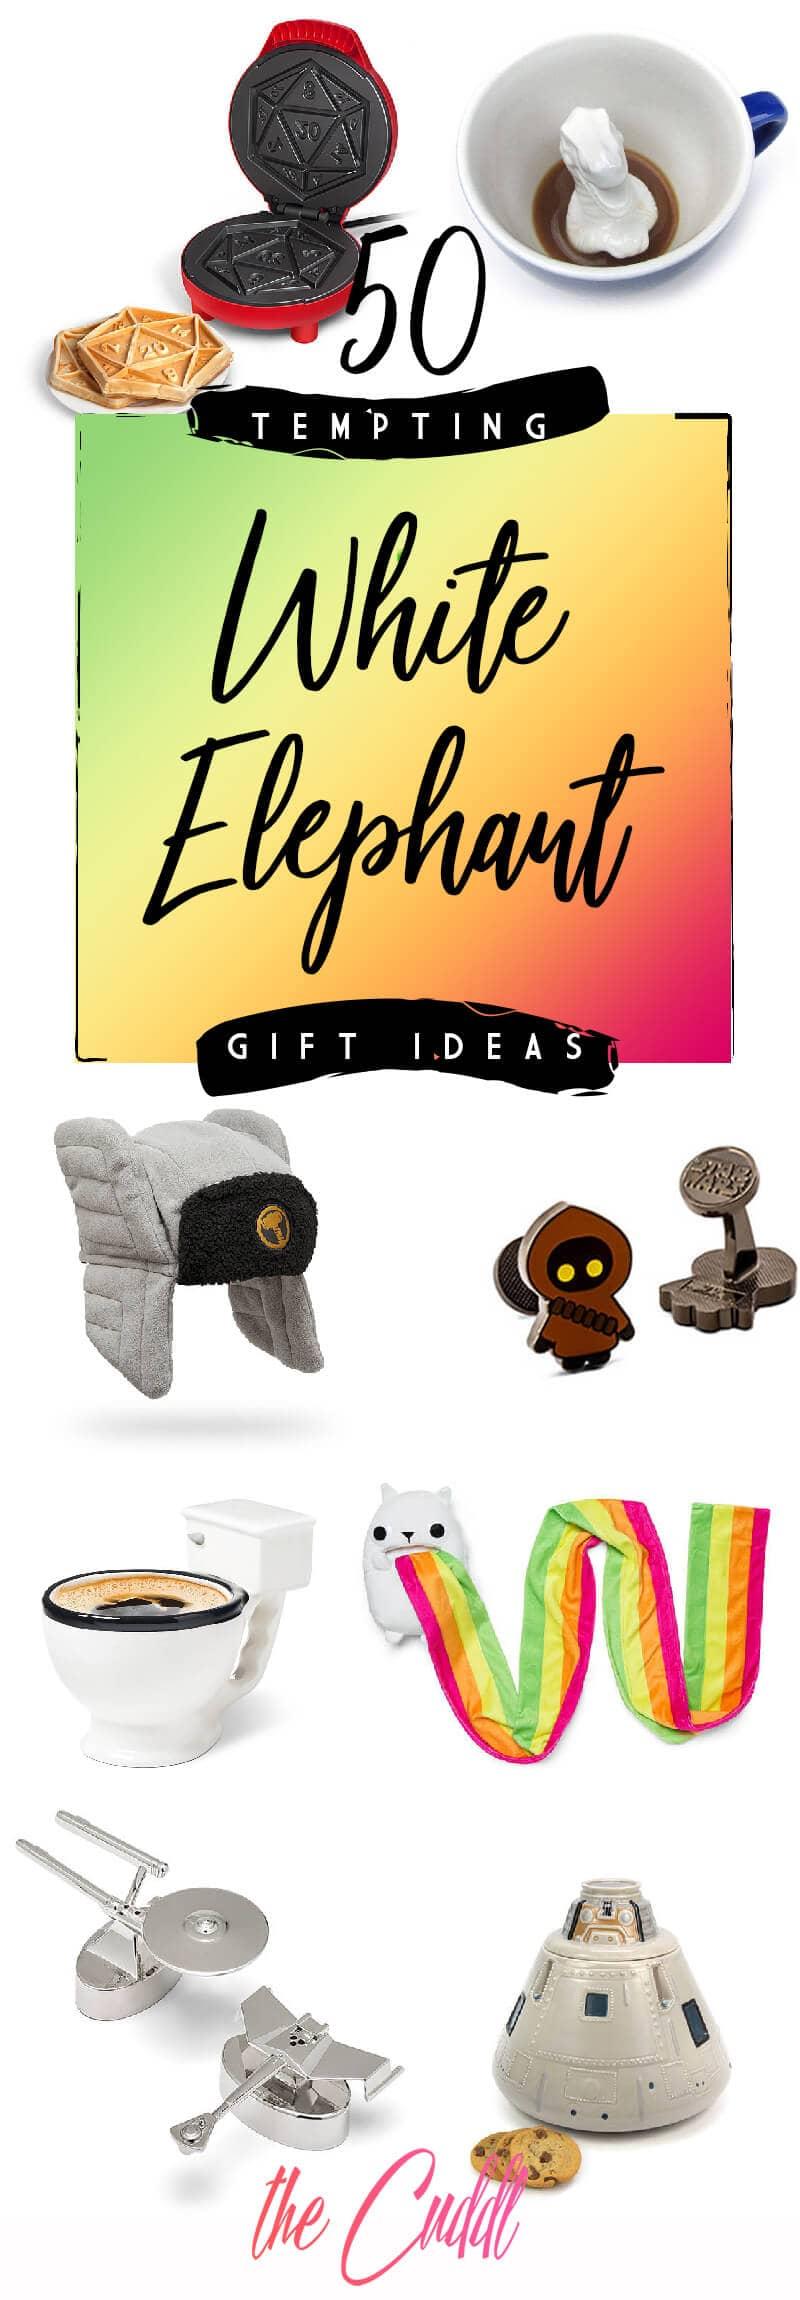 White Elephant Gift Ideas 2019 50 Trade Provoking White Elephant Gift Ideas for Your 2019 Gift